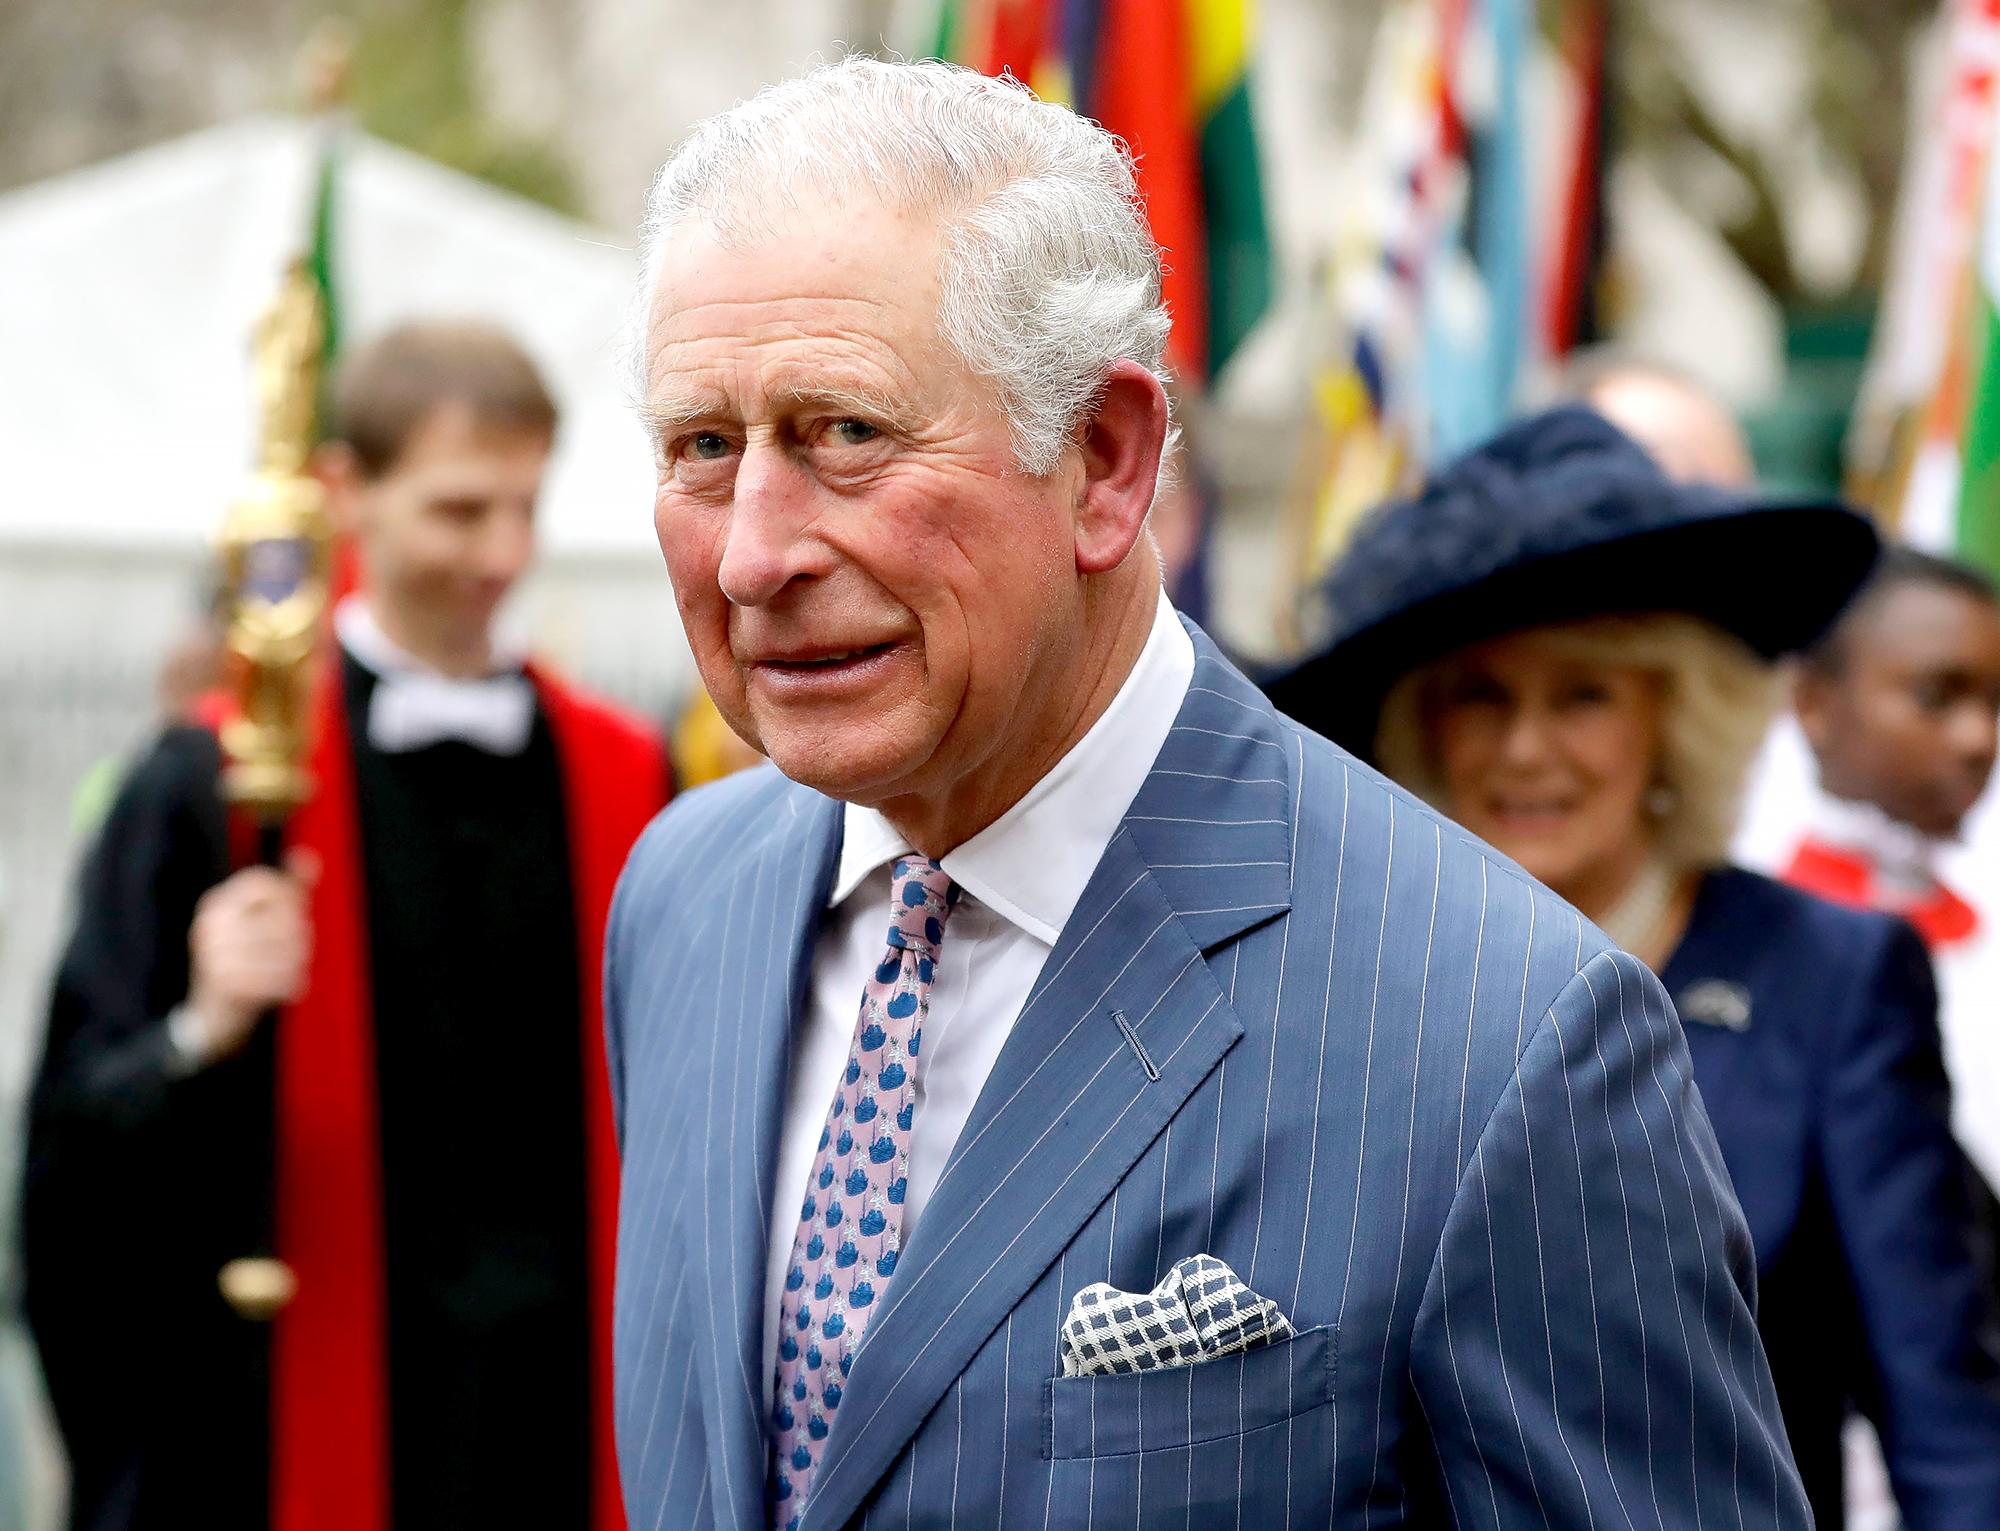 Prince Charles Opens Coronavirus Field Hospital After Diagnosis